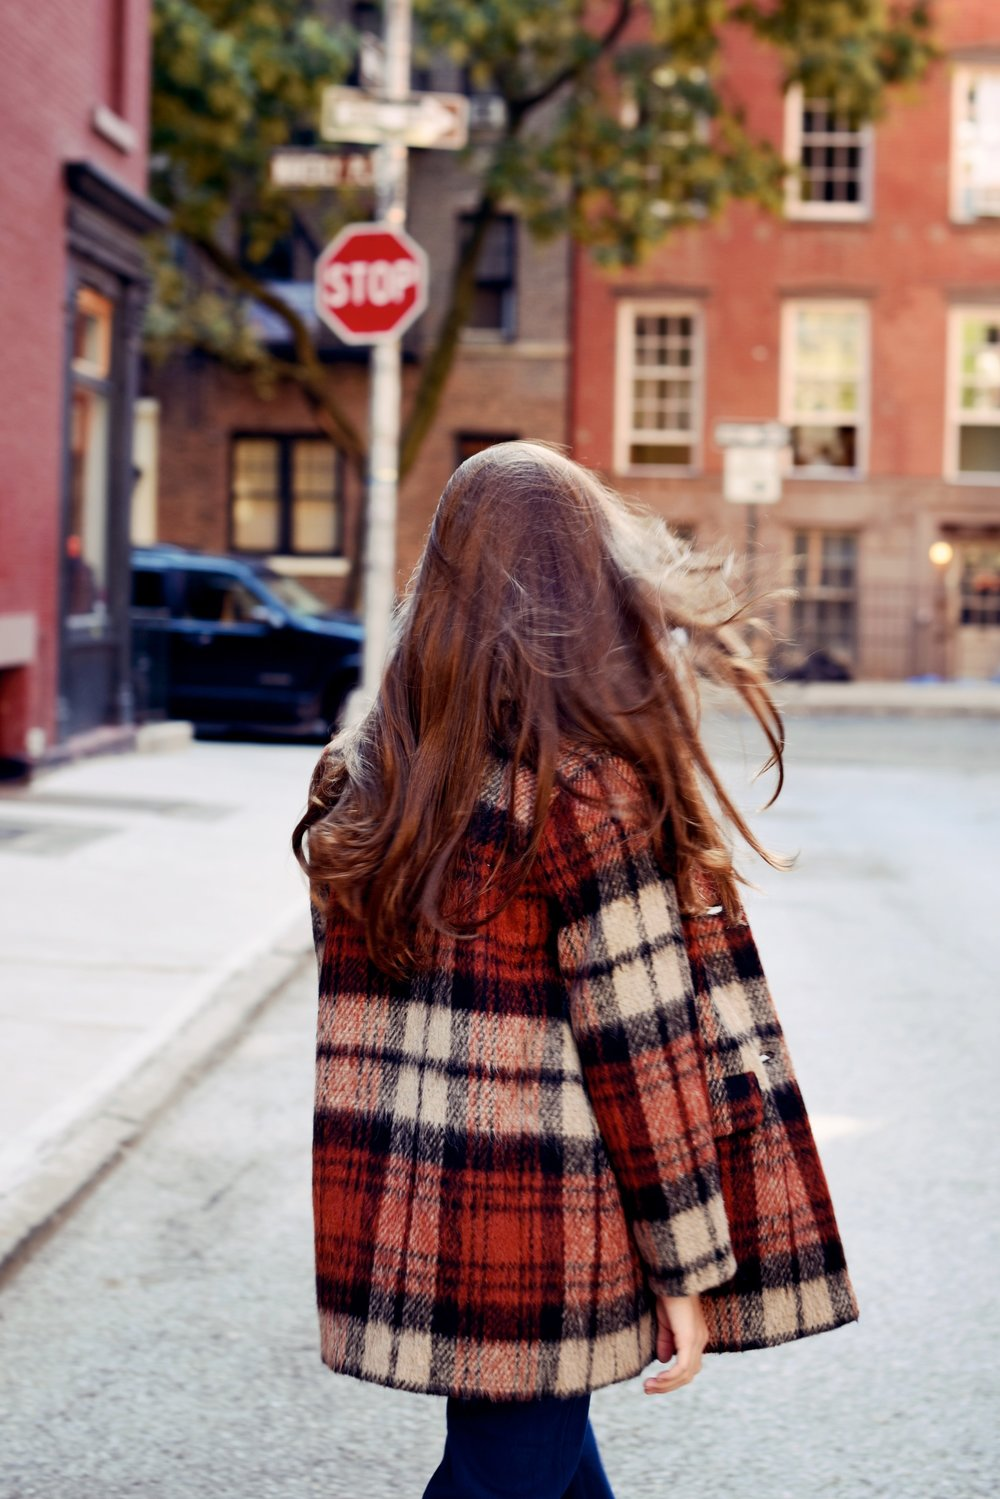 Enfant+Street+Style+by+Gina+Kim+Photography-15.jpeg